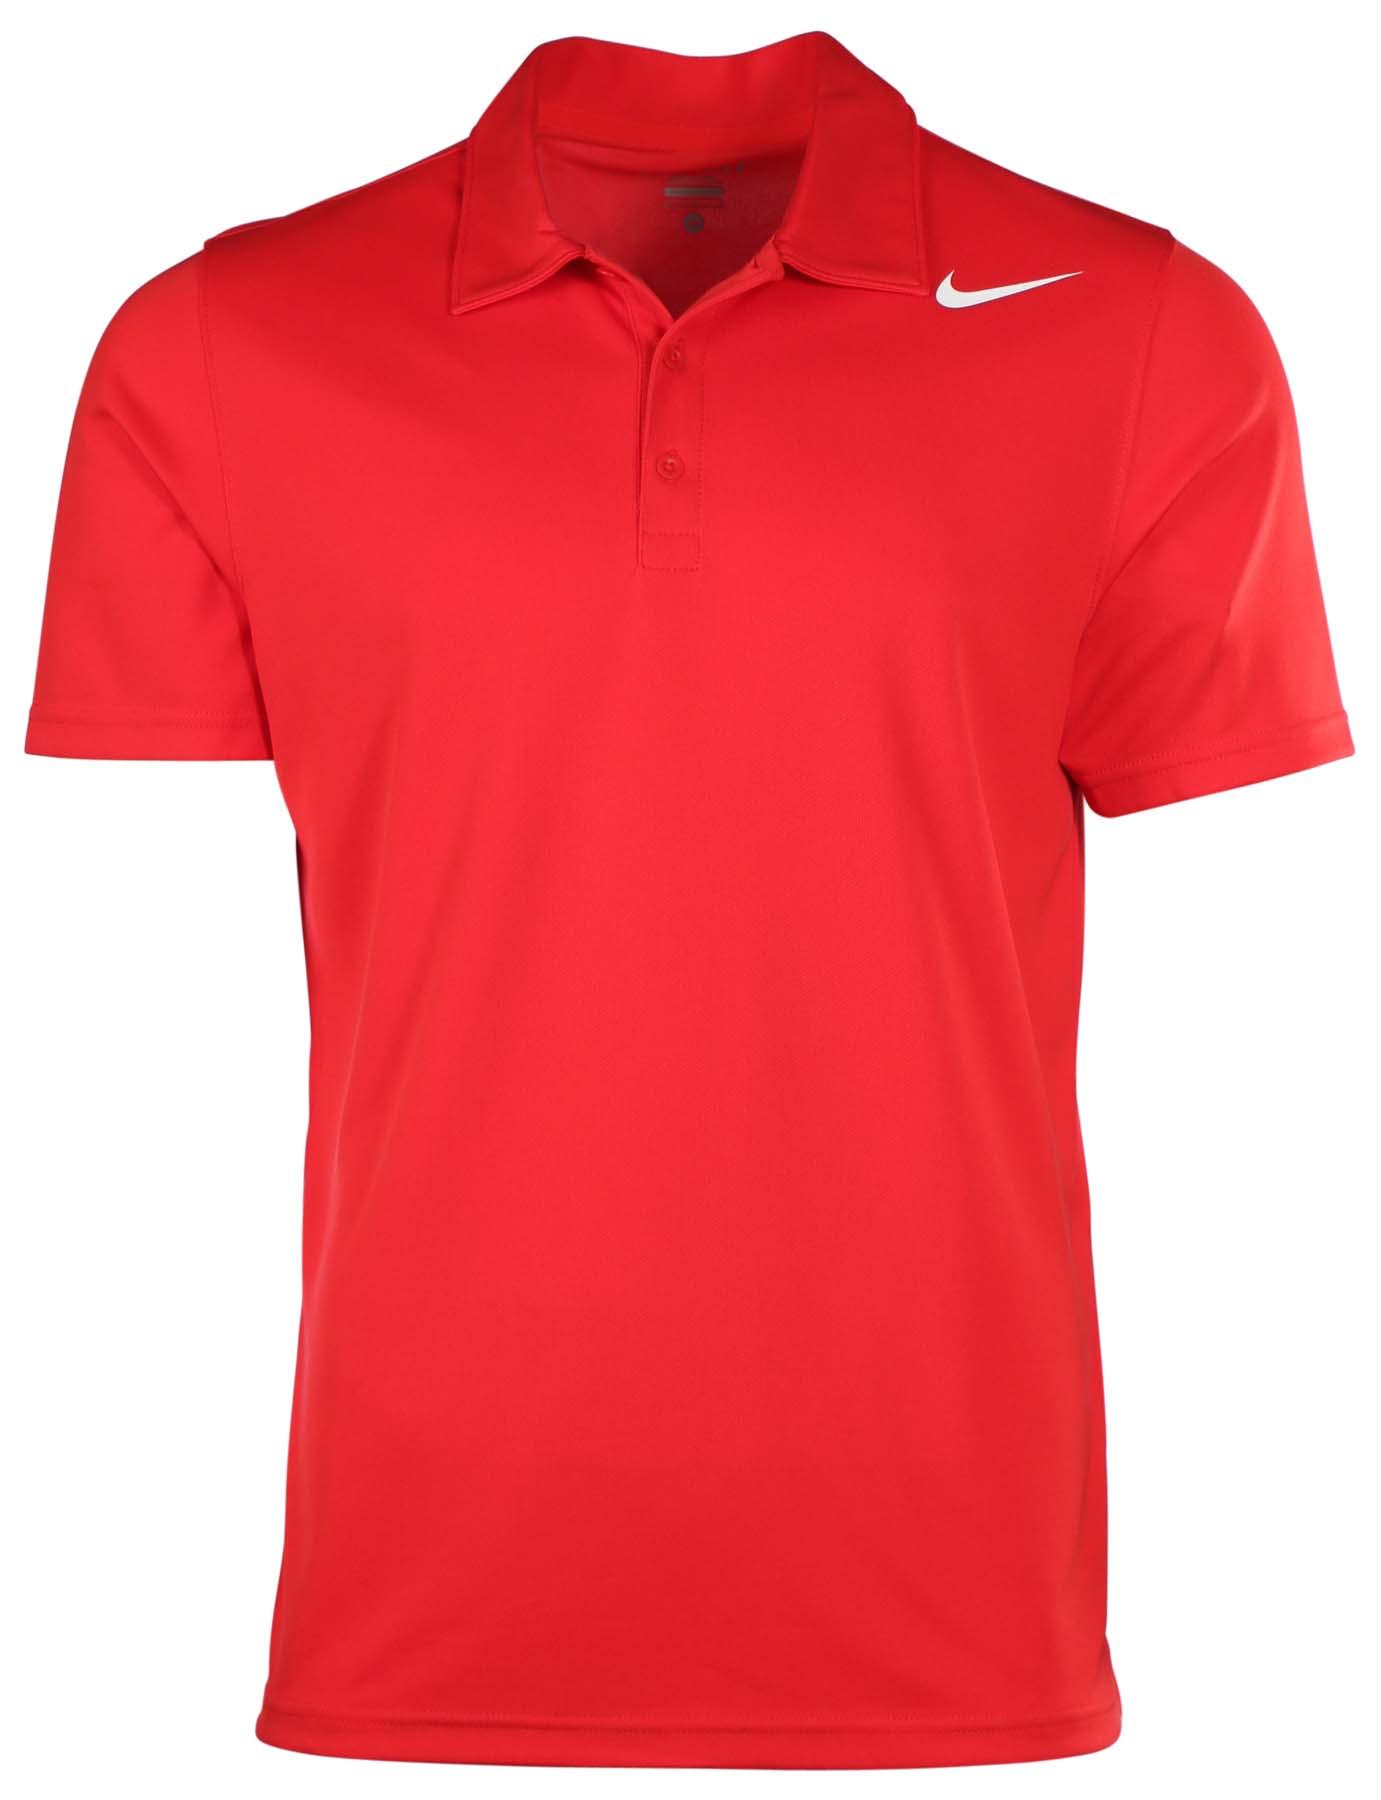 Nike men 39 s dri fit stay cool tennis polo shirt ebay for Dri fit polo shirts for boys